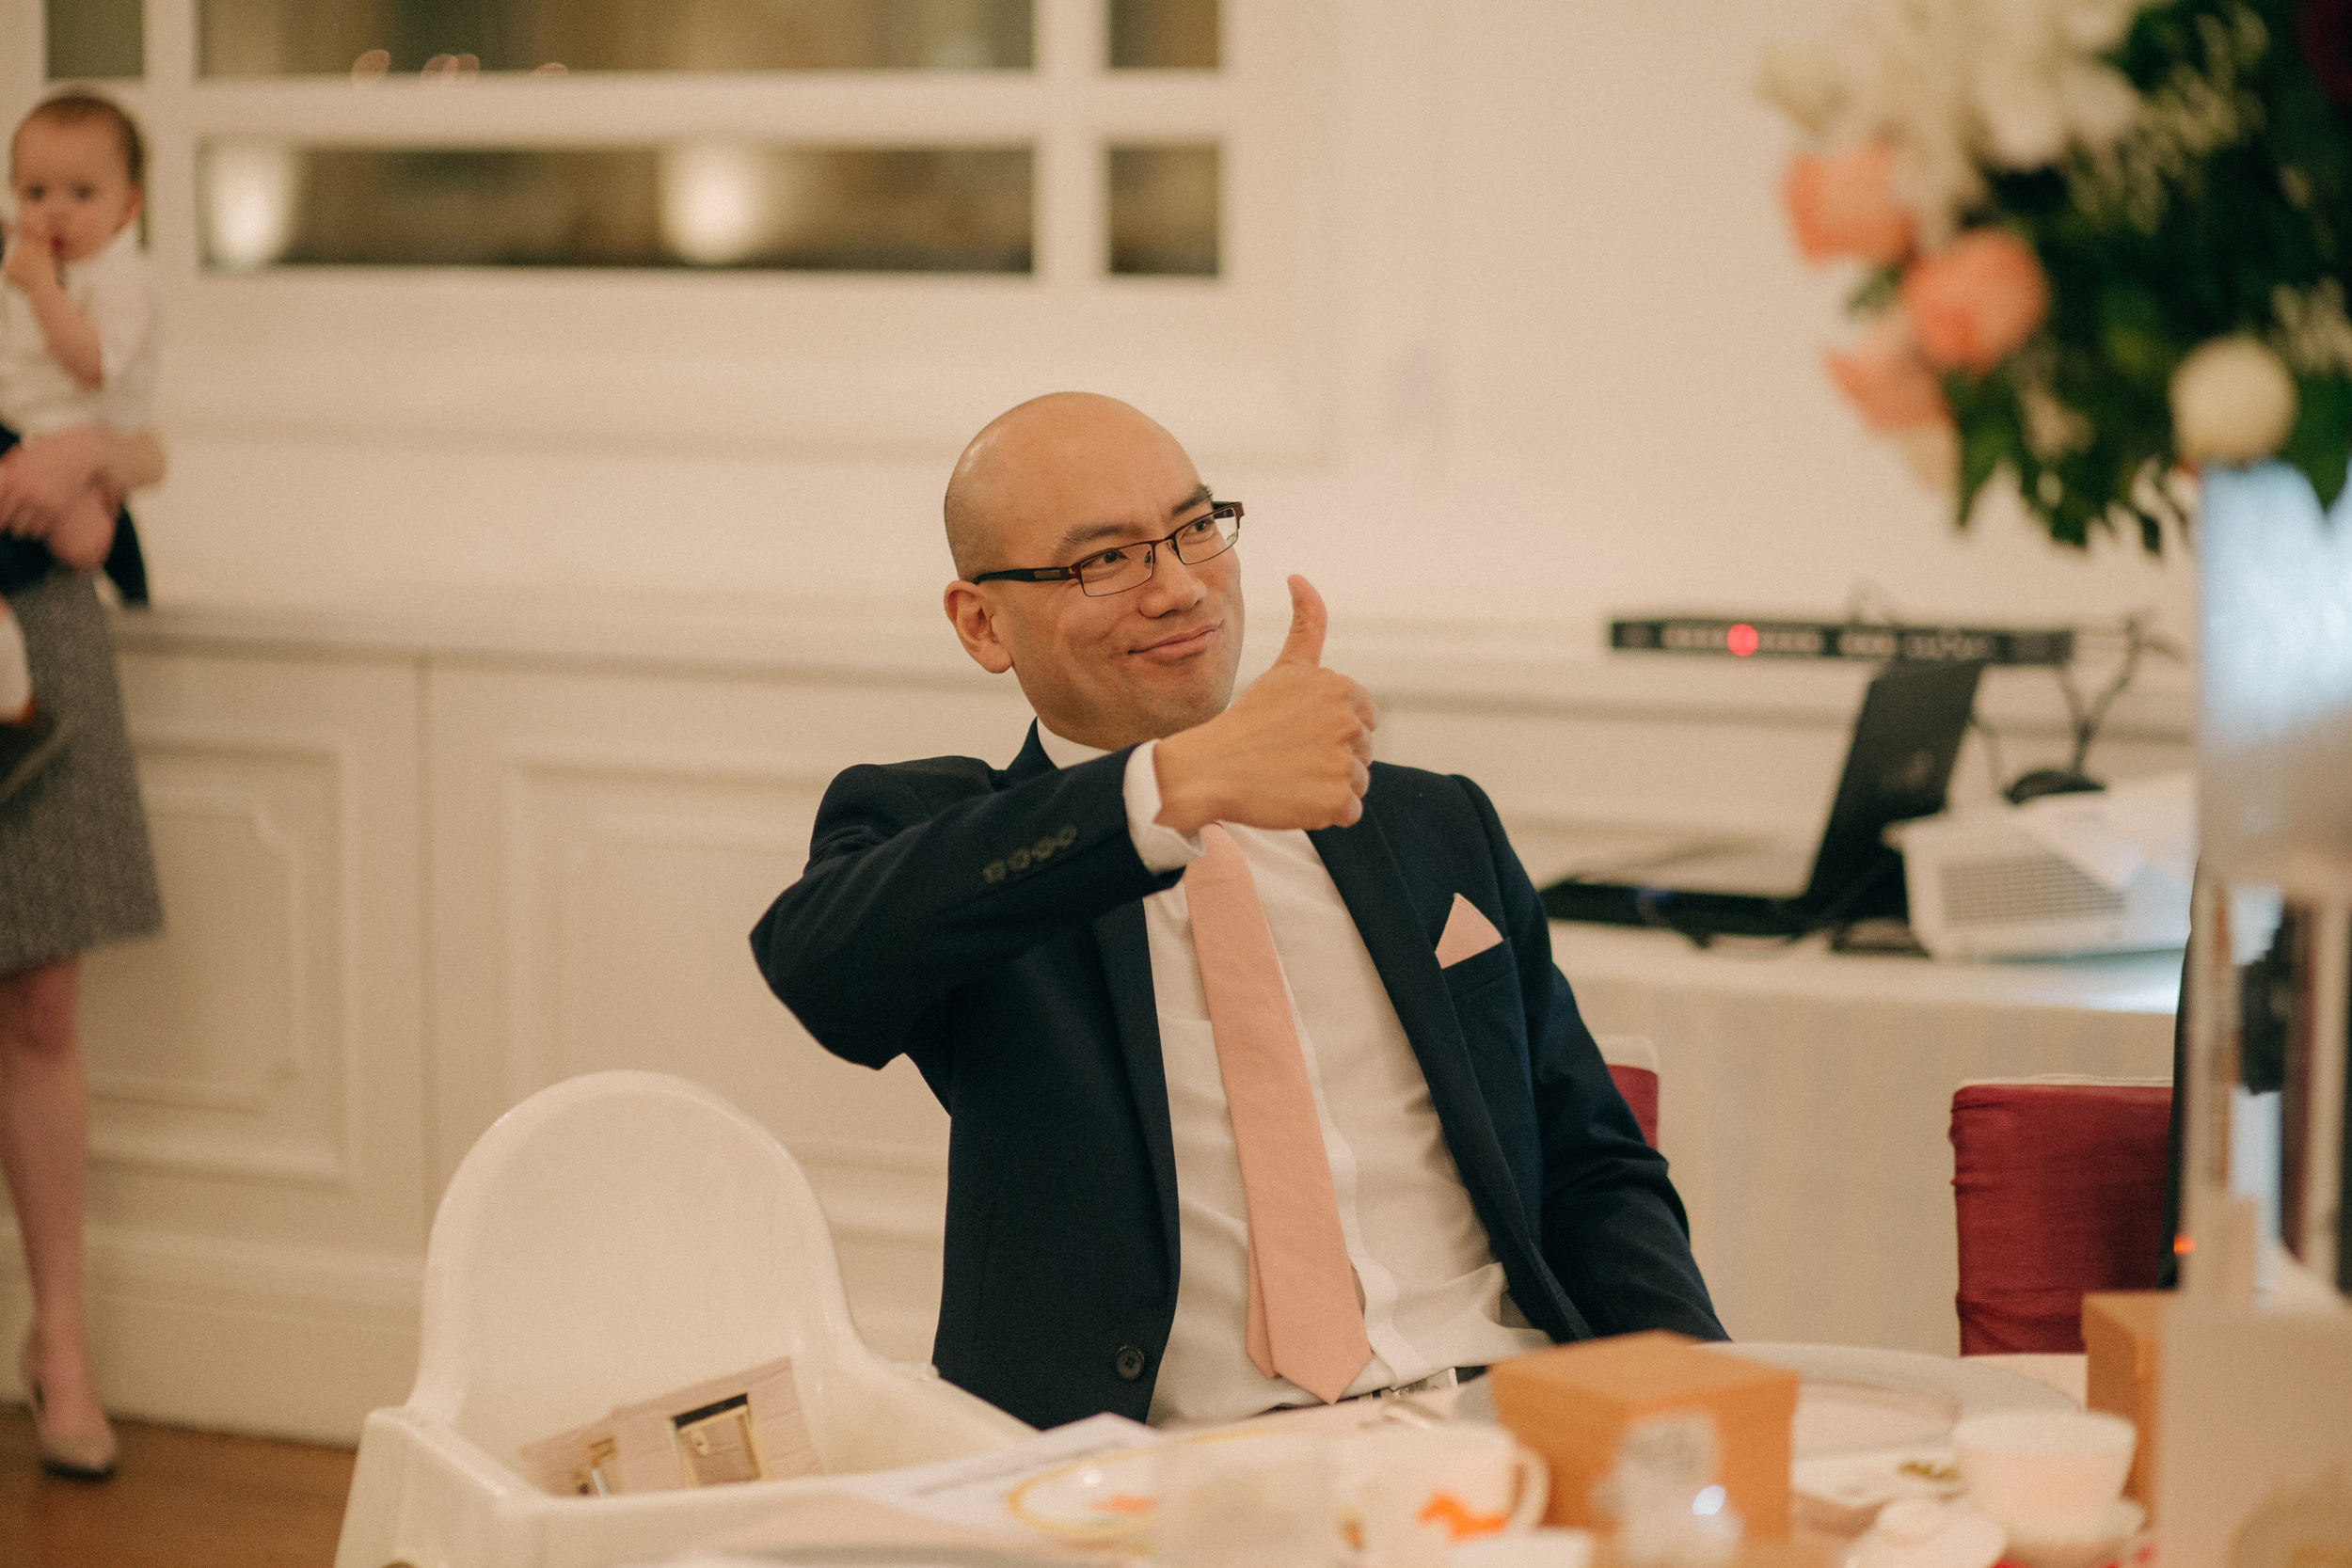 singapore-wedding-photographer-cheryl-matthew-fullerton-hotel-wedding-60.jpg